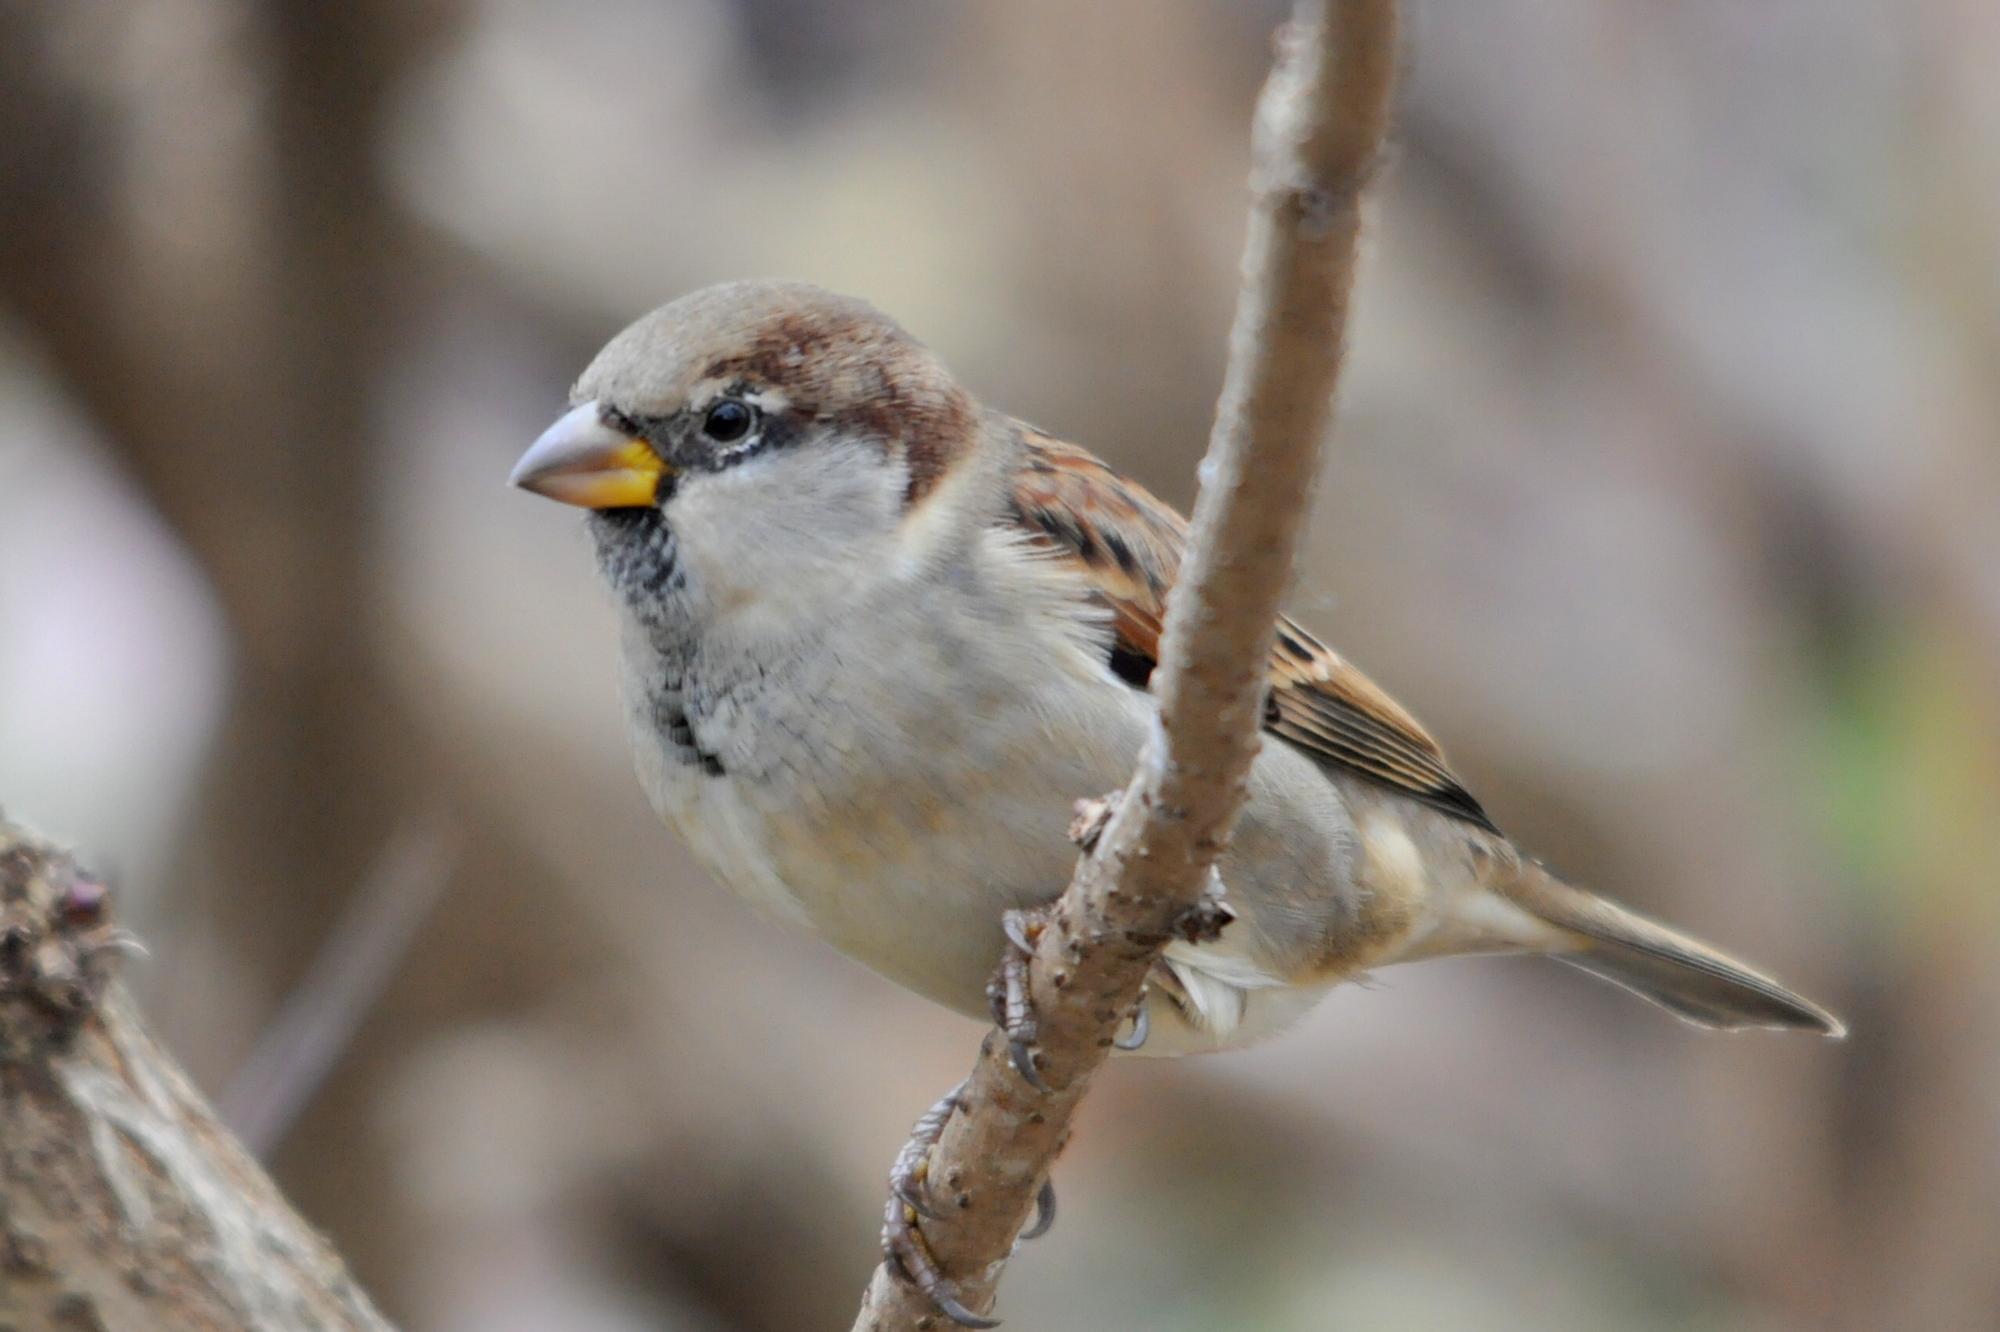 Domači vrabec